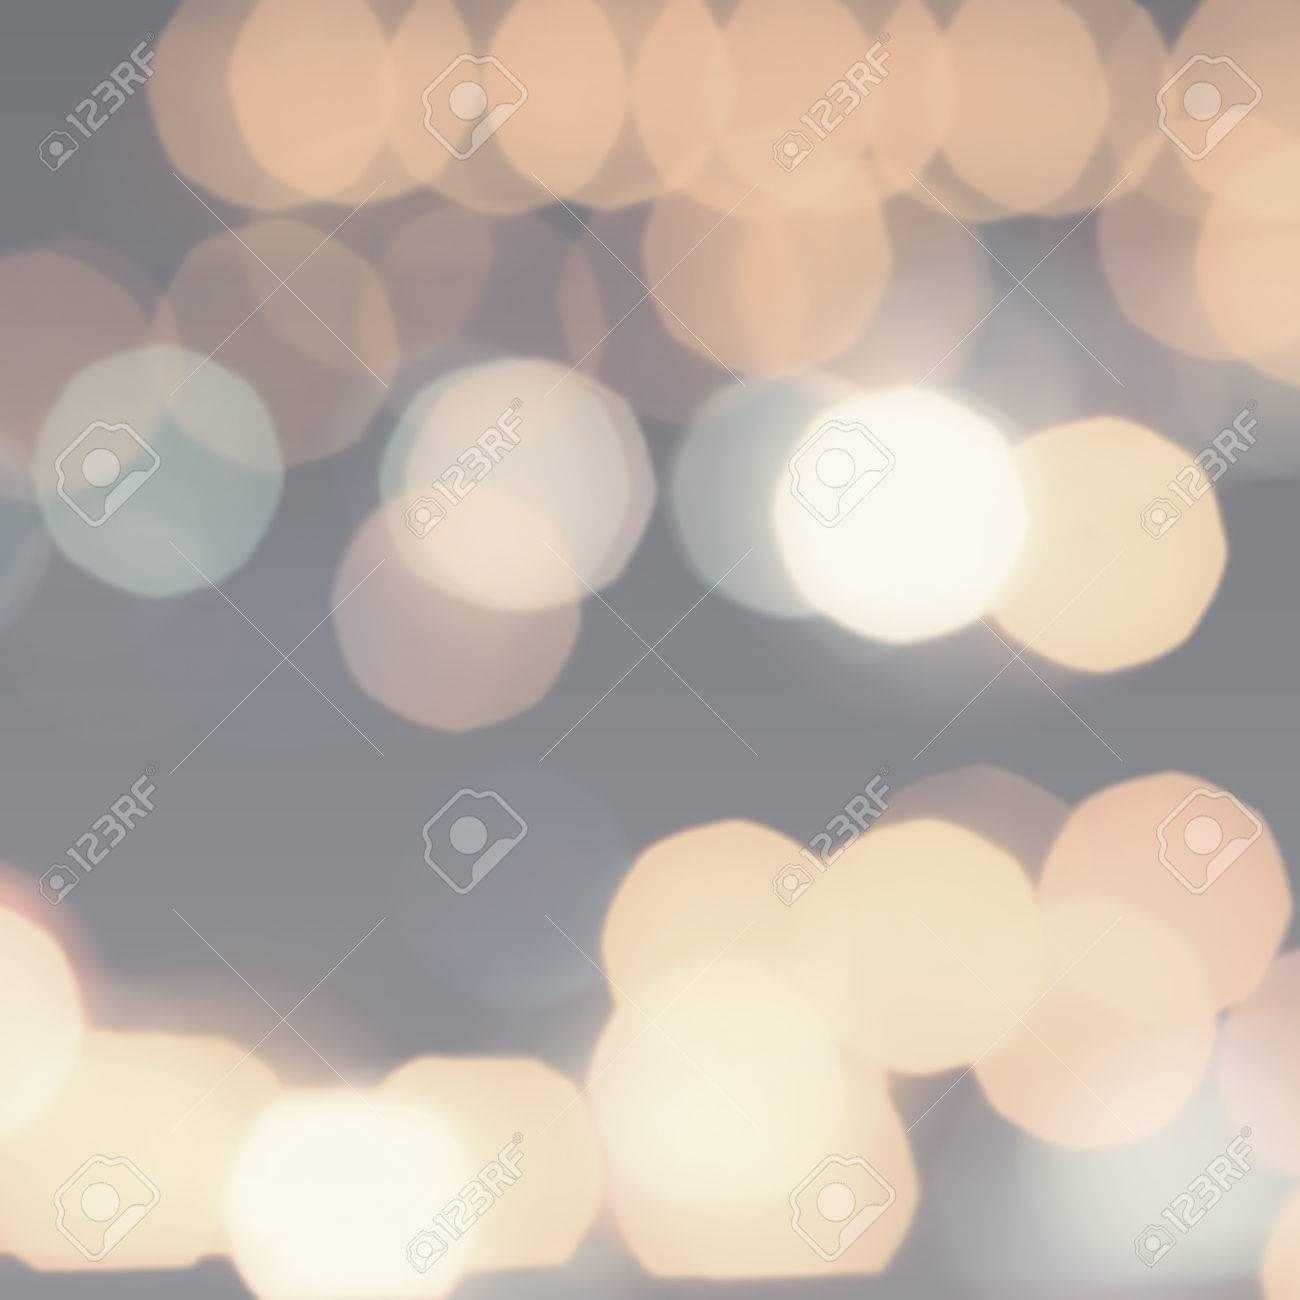 82 soft light